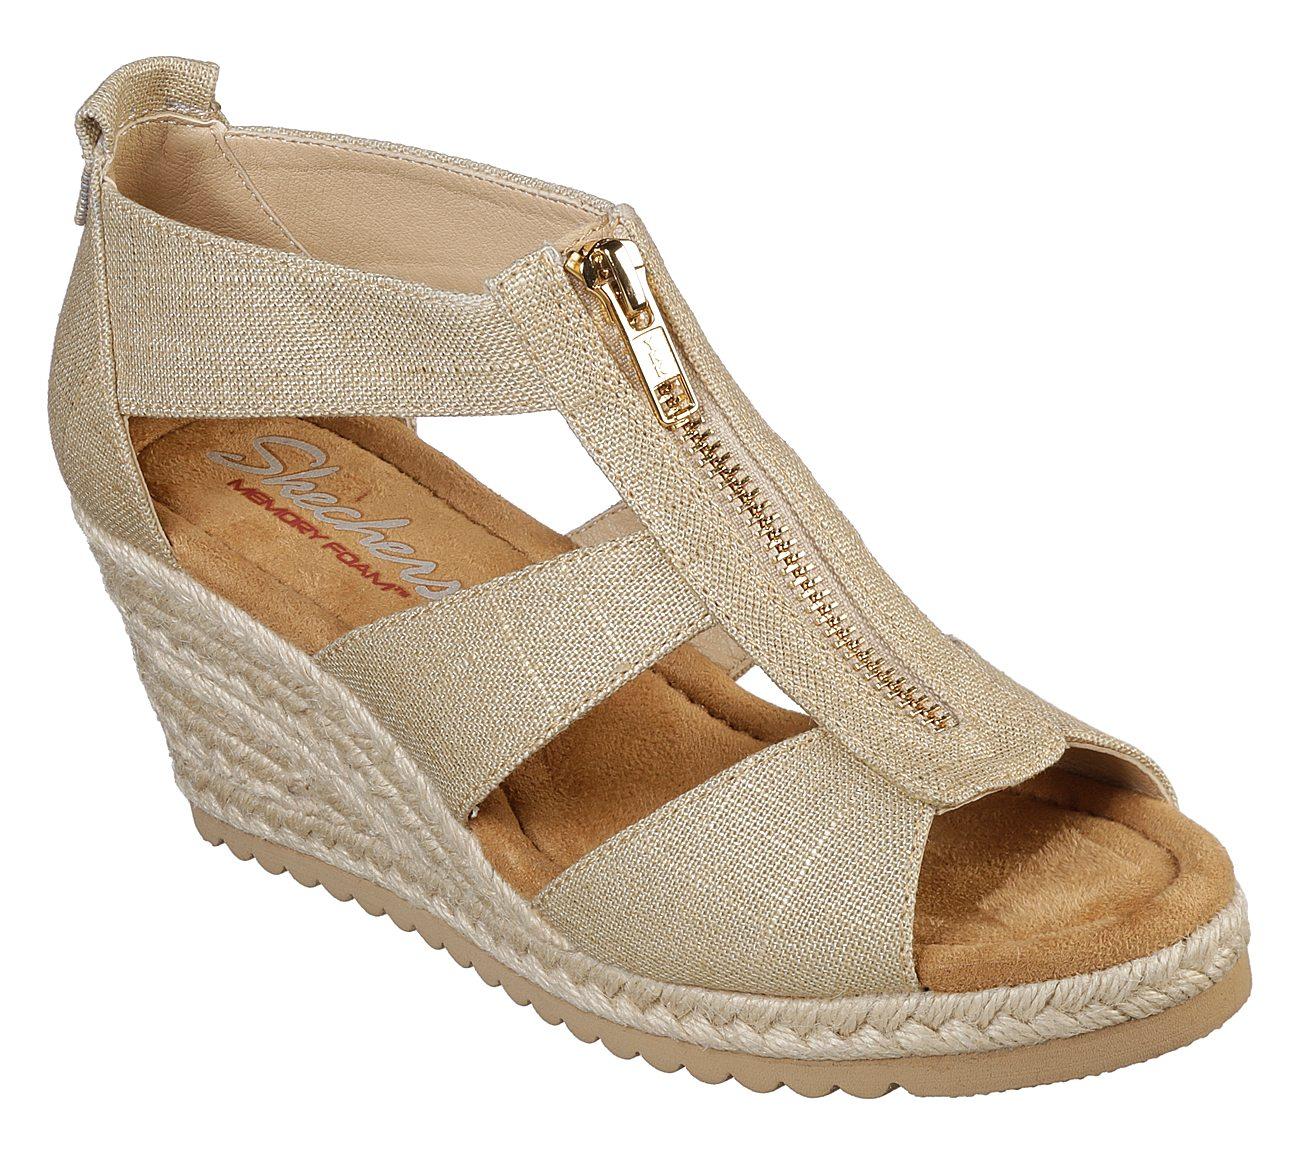 SKECHERS Monarchs - Ready Steady Cali Shoes